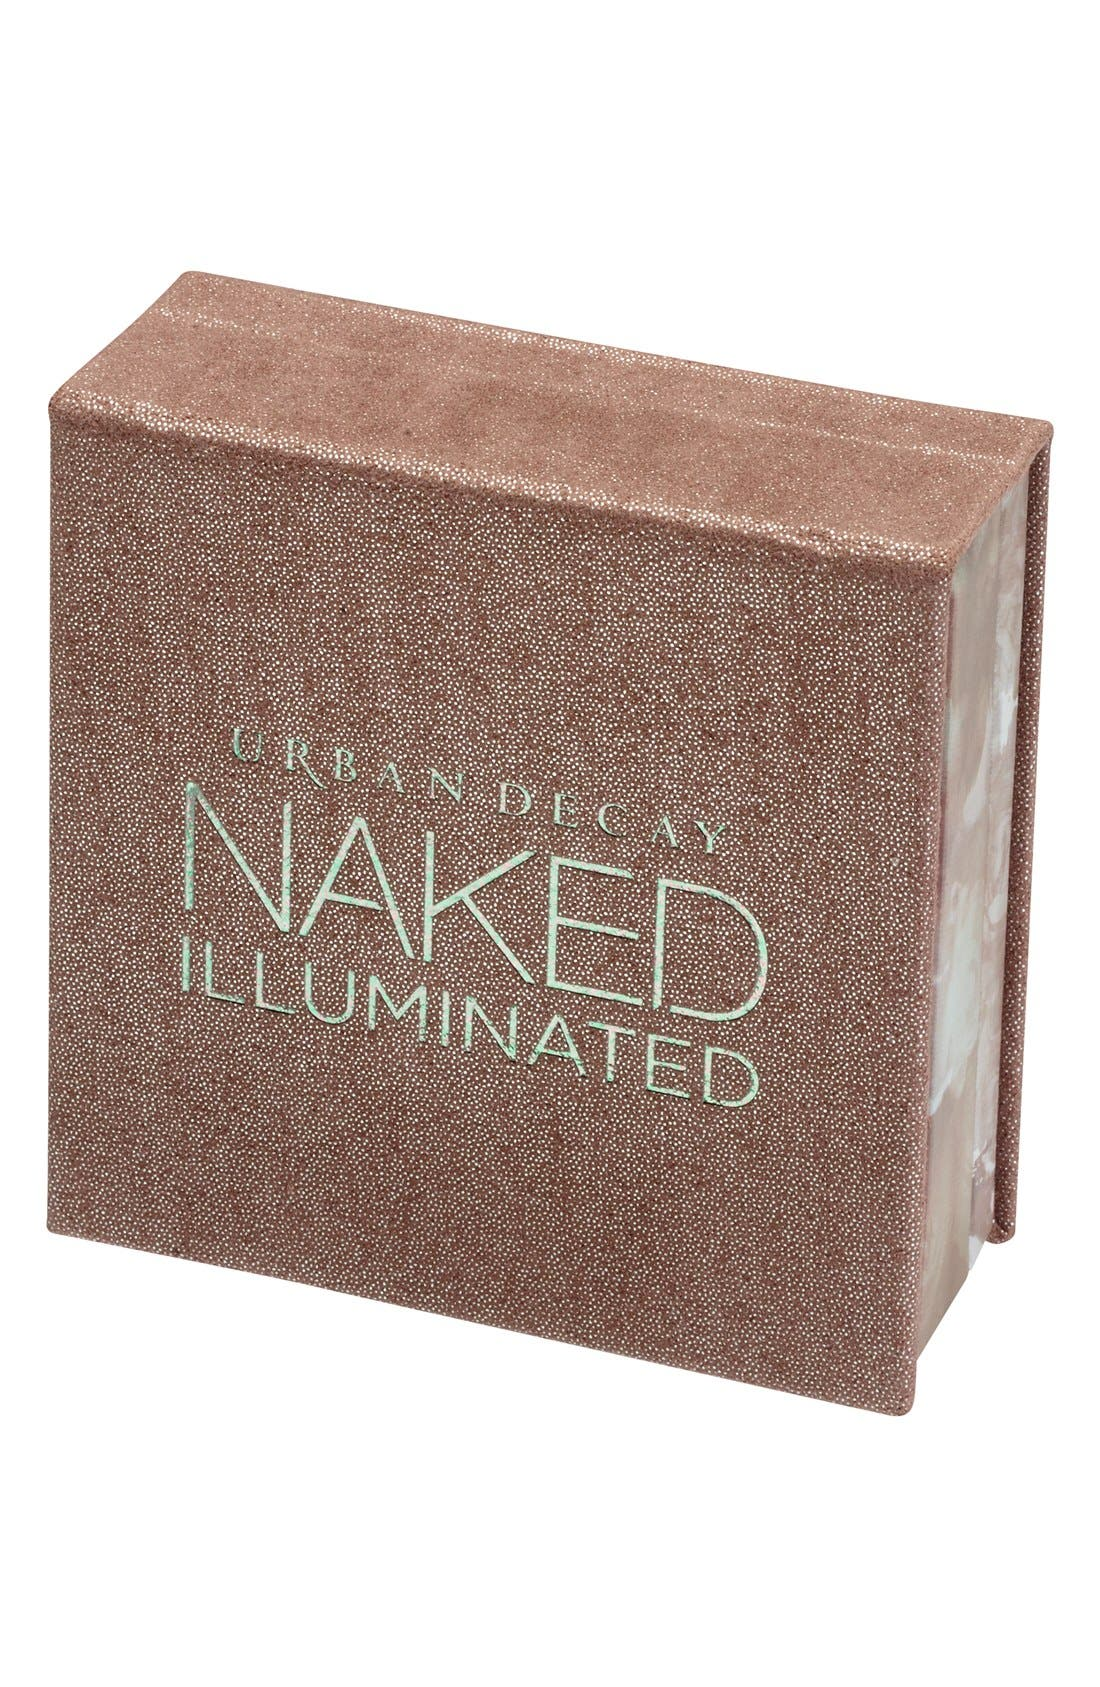 Naked Illuminated Shimmering Powder for Face & Body,                             Alternate thumbnail 4, color,                             LUMINOUS